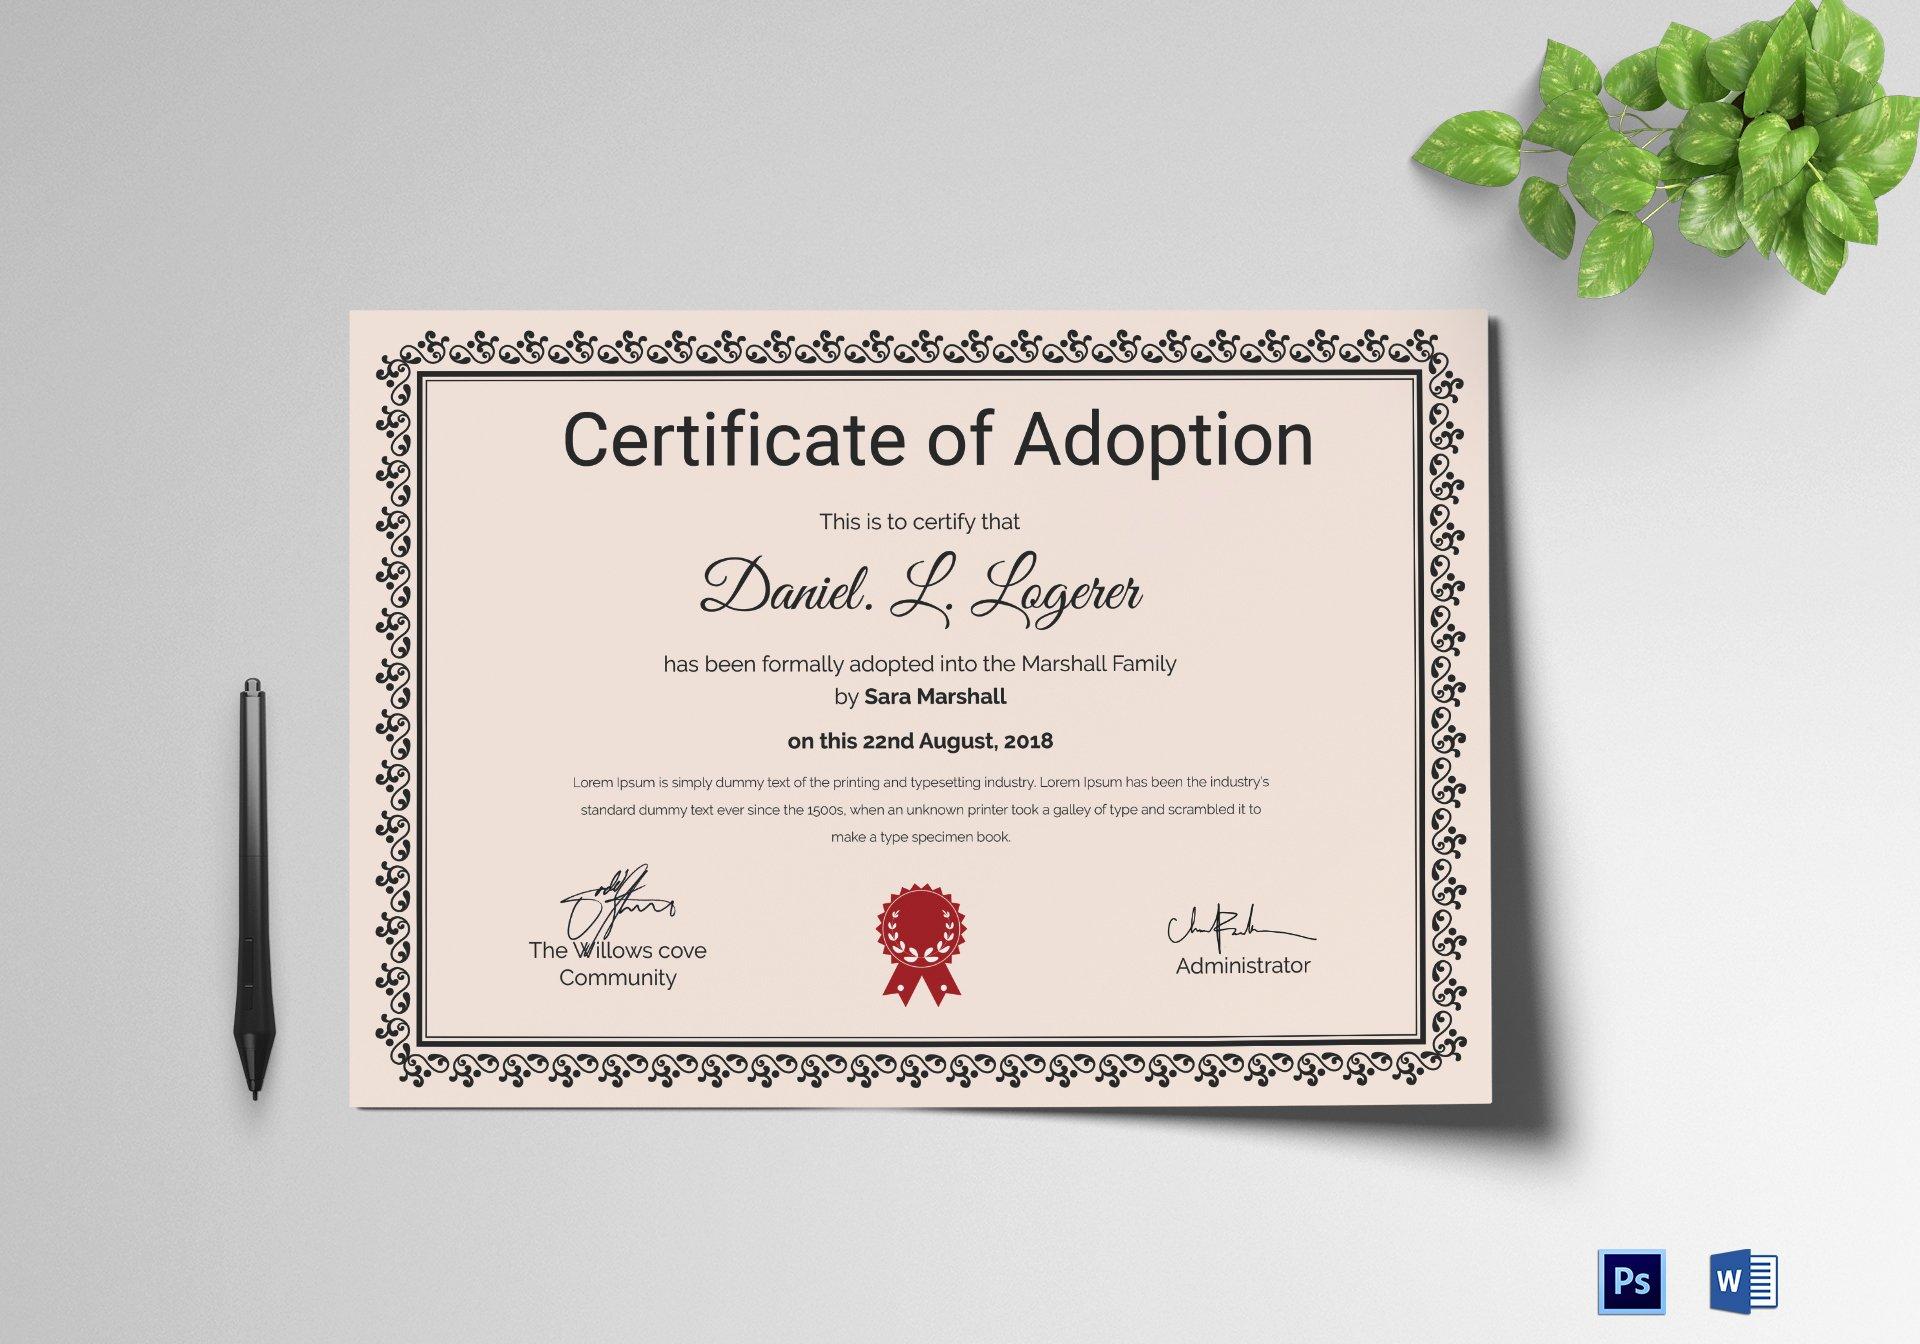 Adoption Certificate Template Word Unique Happy Adoption Certificate Design Template In Psd Word